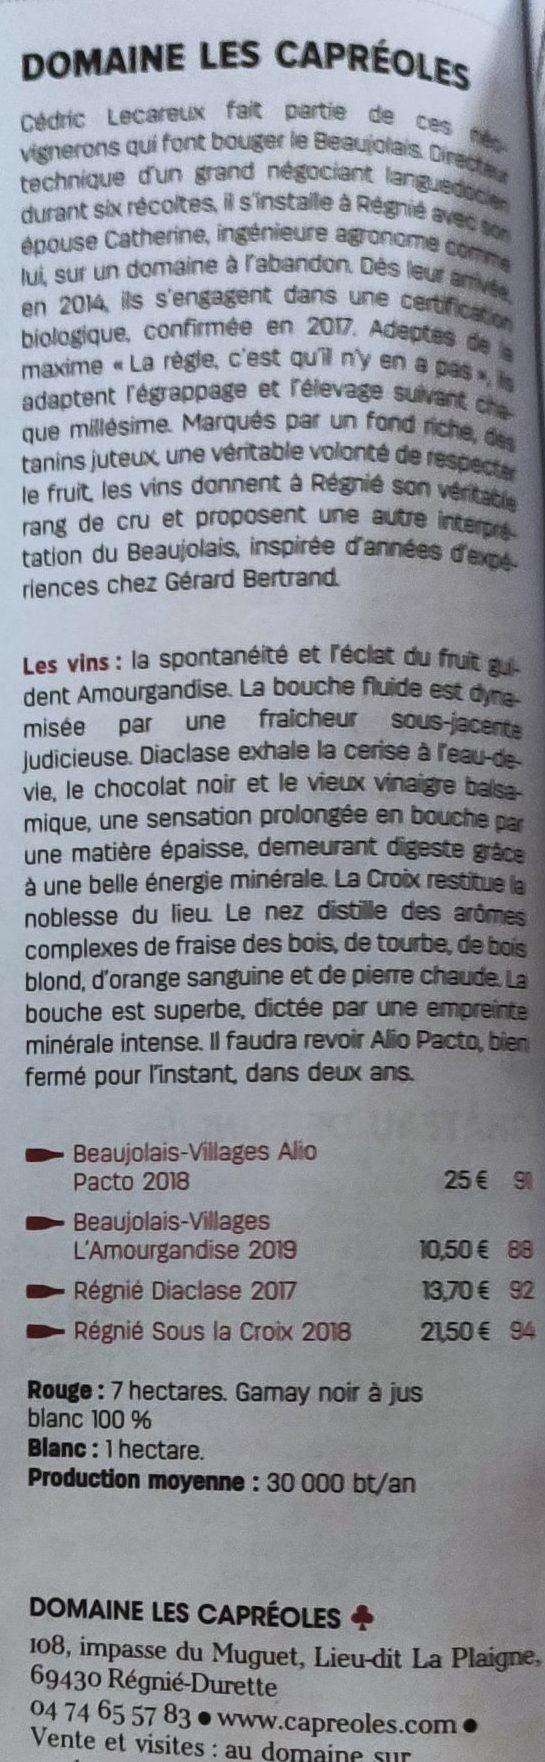 Guide vert 2021 Revue du vin de France